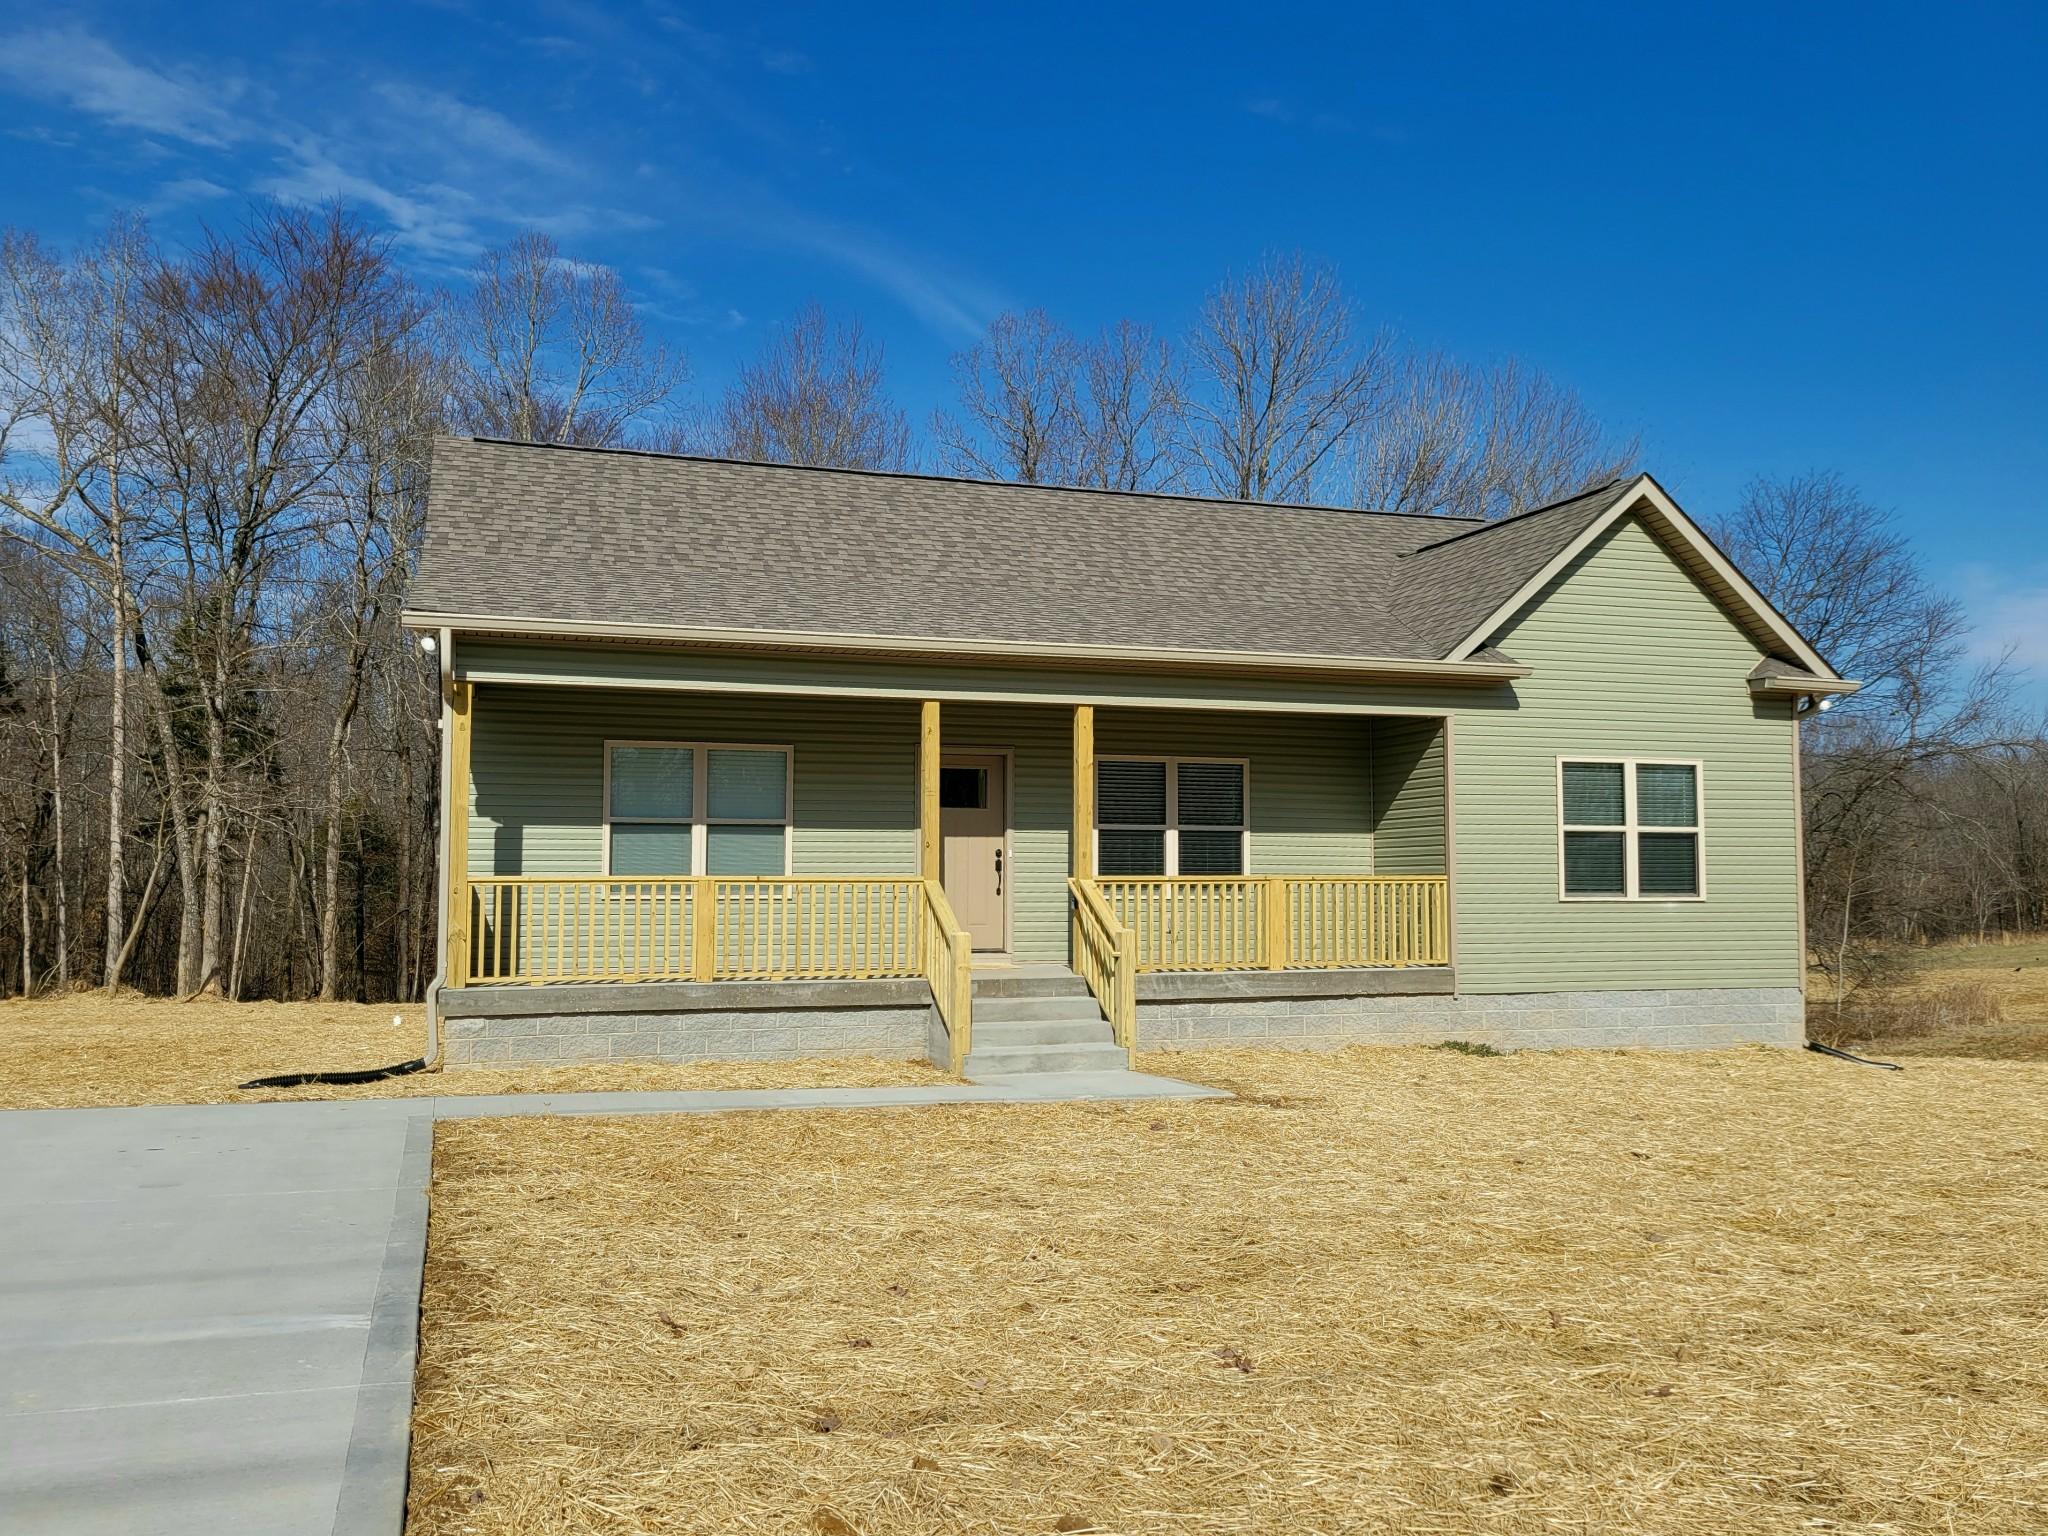 3798 Bowker Rd Property Photo - Charlotte, TN real estate listing